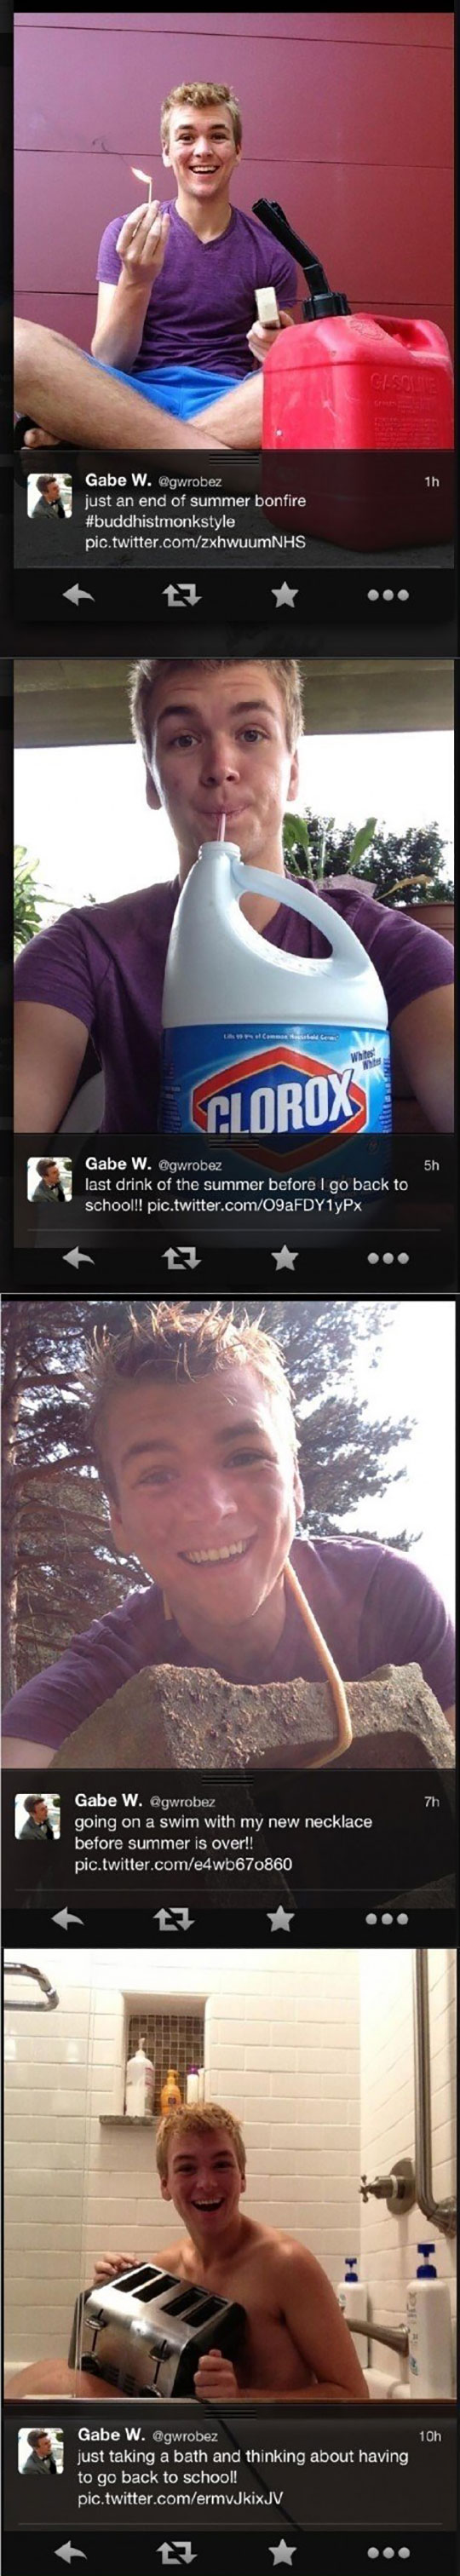 funny-teen-Twitter-suicide-hint